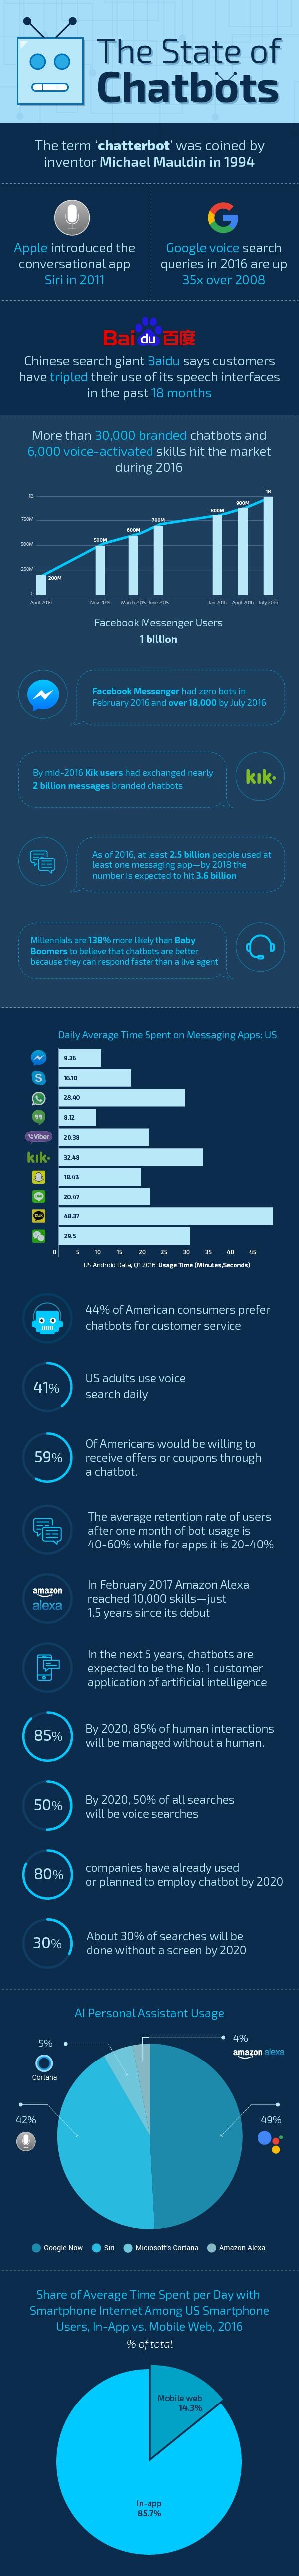 chatbot-infographic-photon.jpg